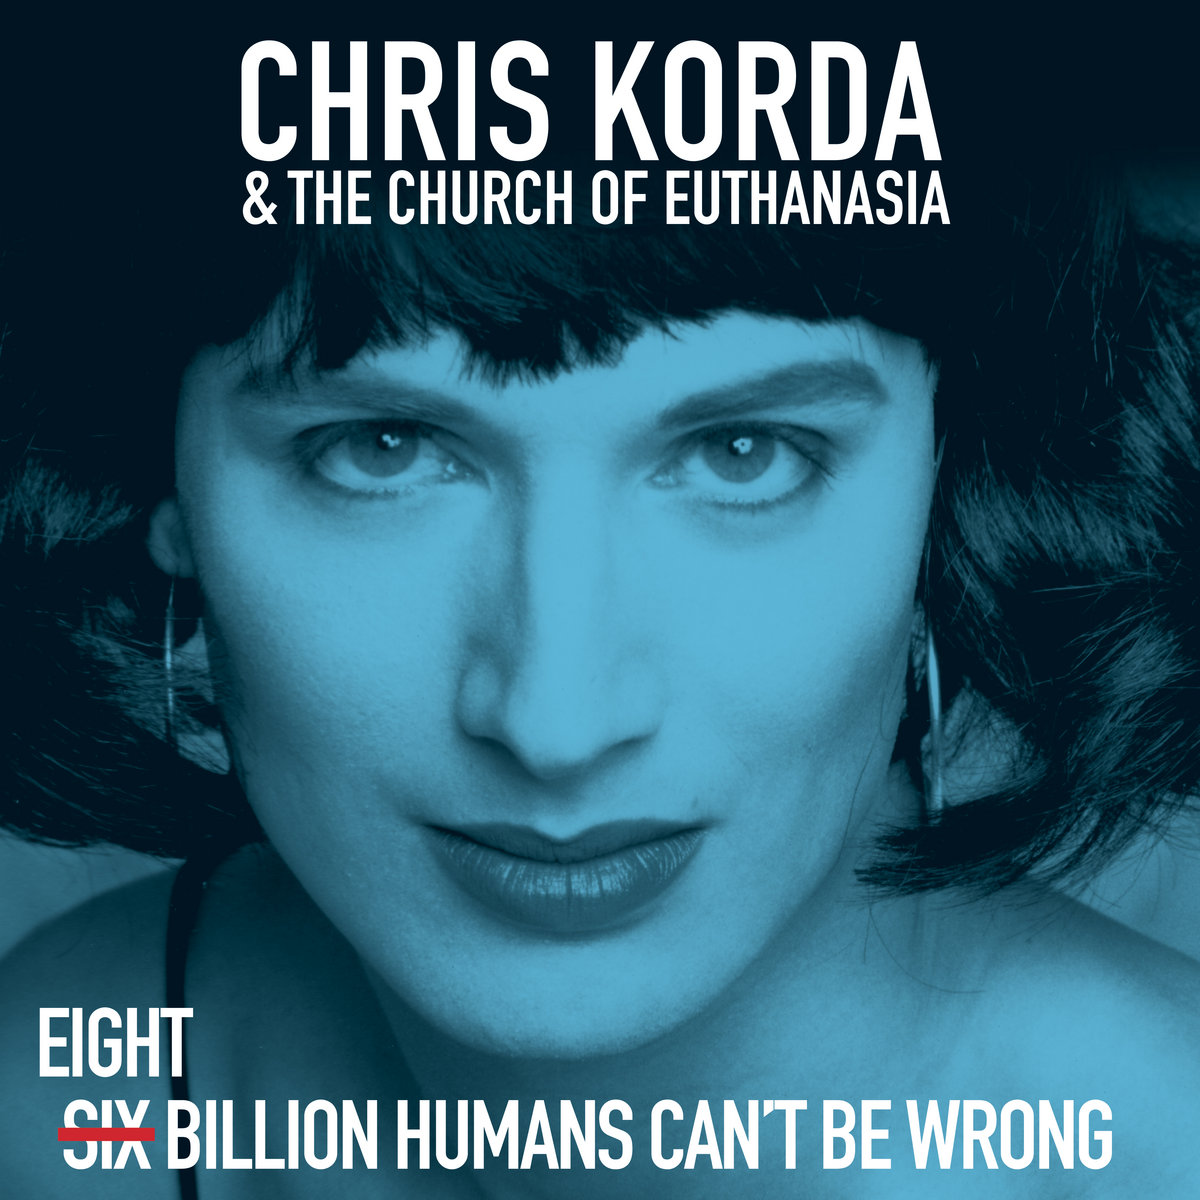 Chris-Korda-Church-Of-Euthanasia-Eigth-Billion-Humans-Cant-be-Wrong.jpg